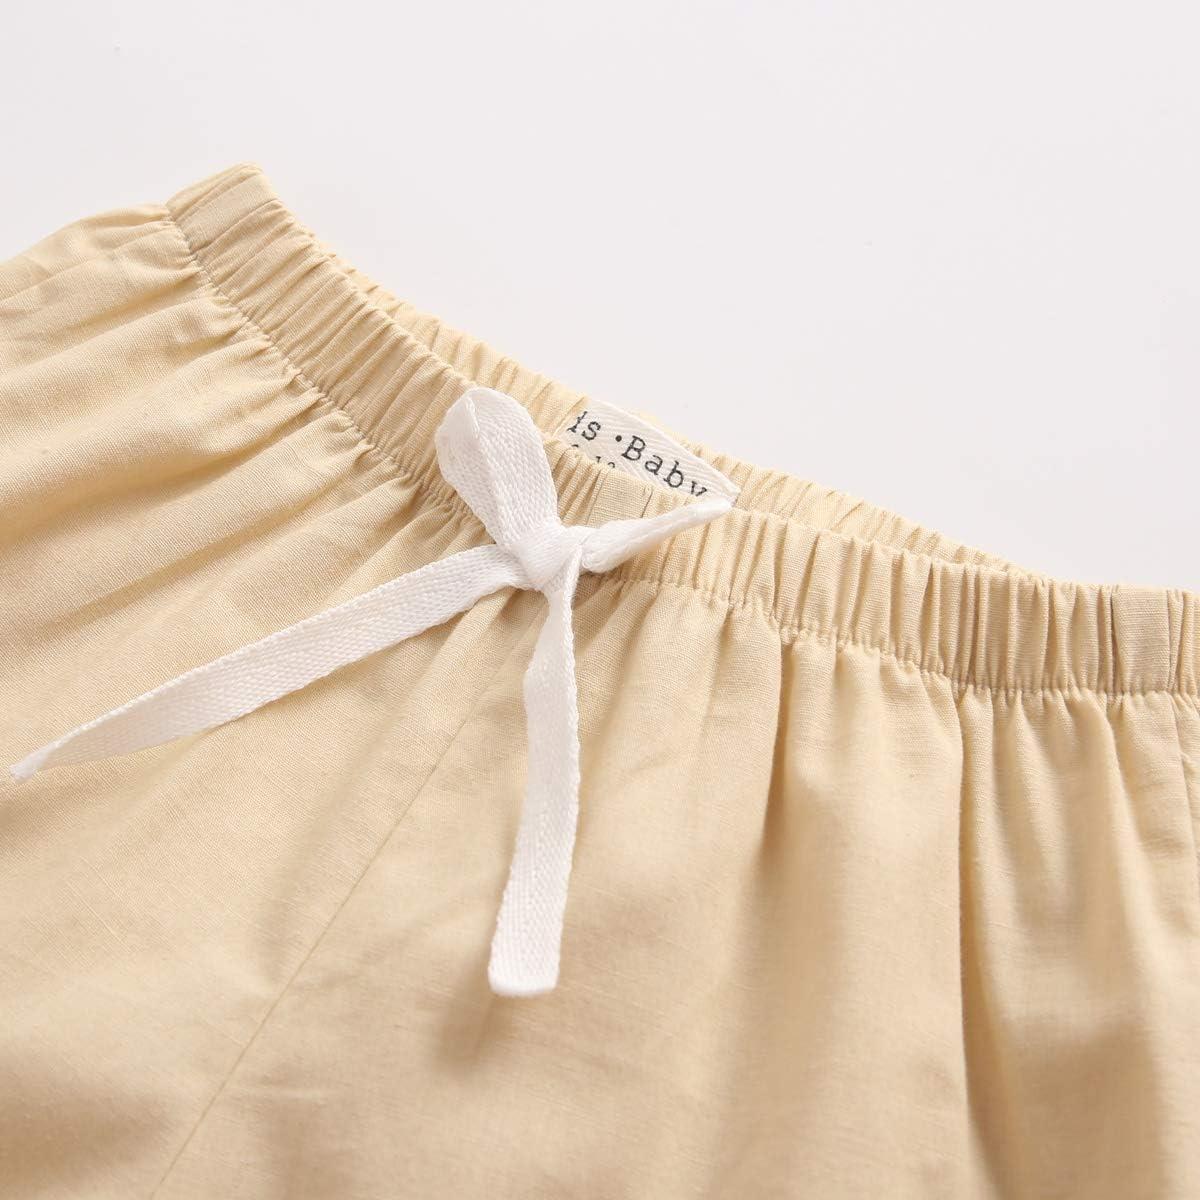 Sanlutoz Baumwolle Baby Junge Kleidung Sets Sommer Karikatur Neugeborene T-Shirt+Kurze Hose